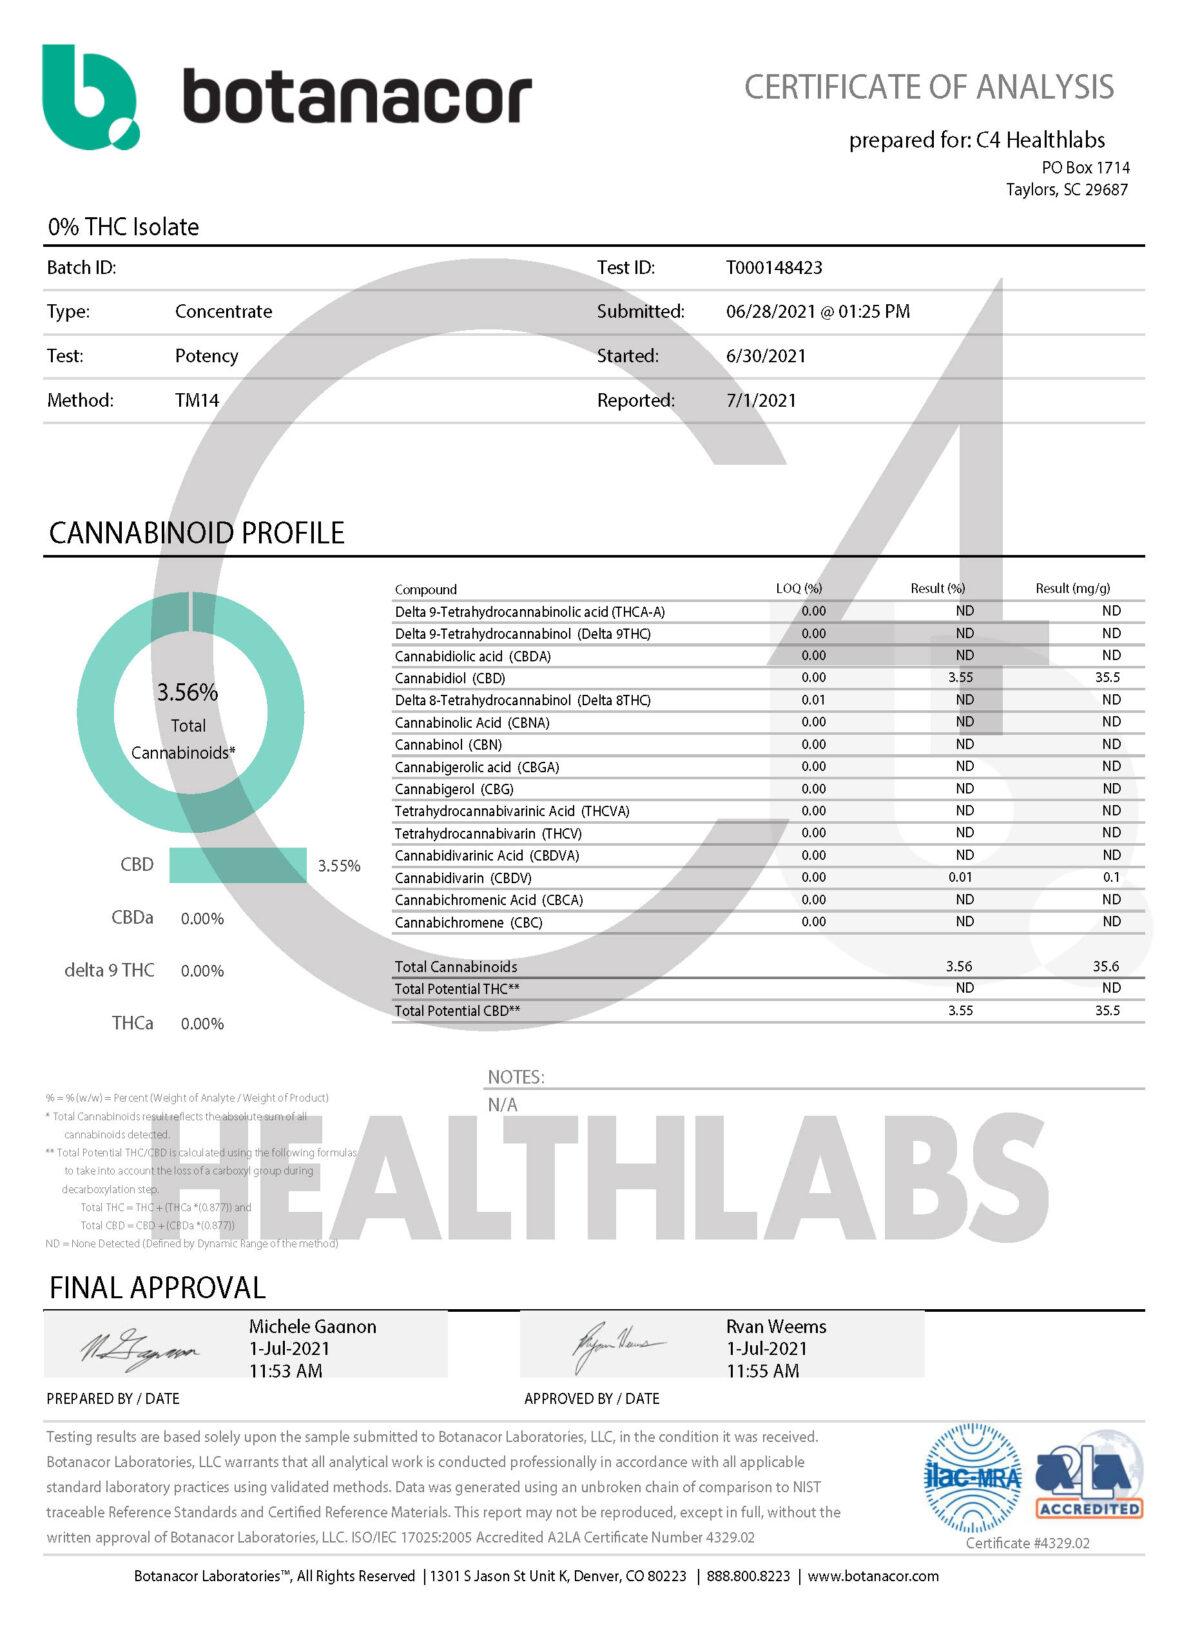 C4 Healthlabs COA for 0THC CBD oil